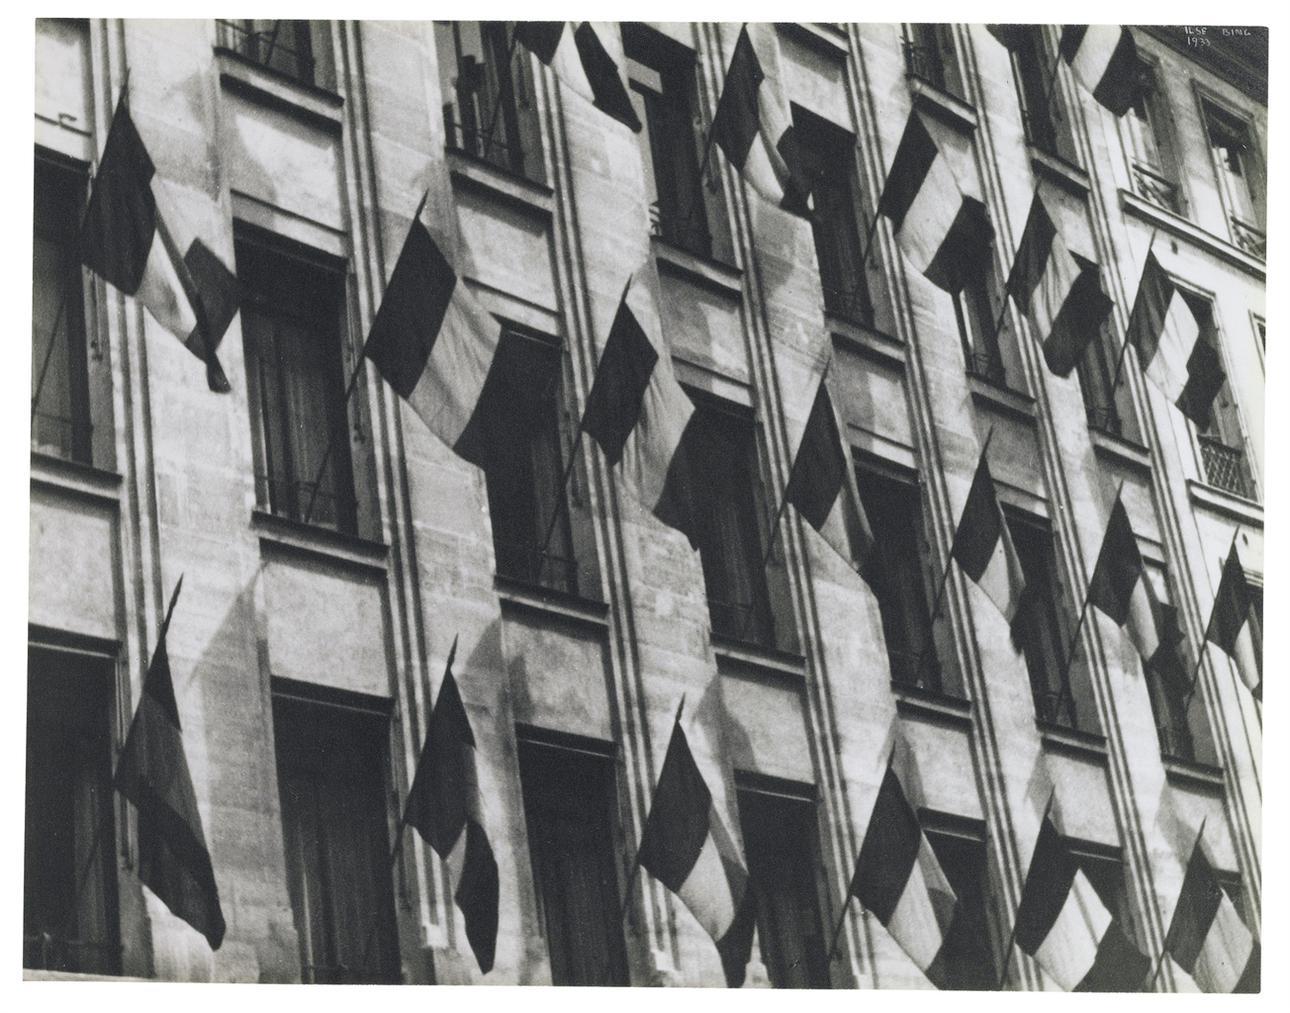 Ilse Bing-Paris Windows With Flags, Bastille Day-1933